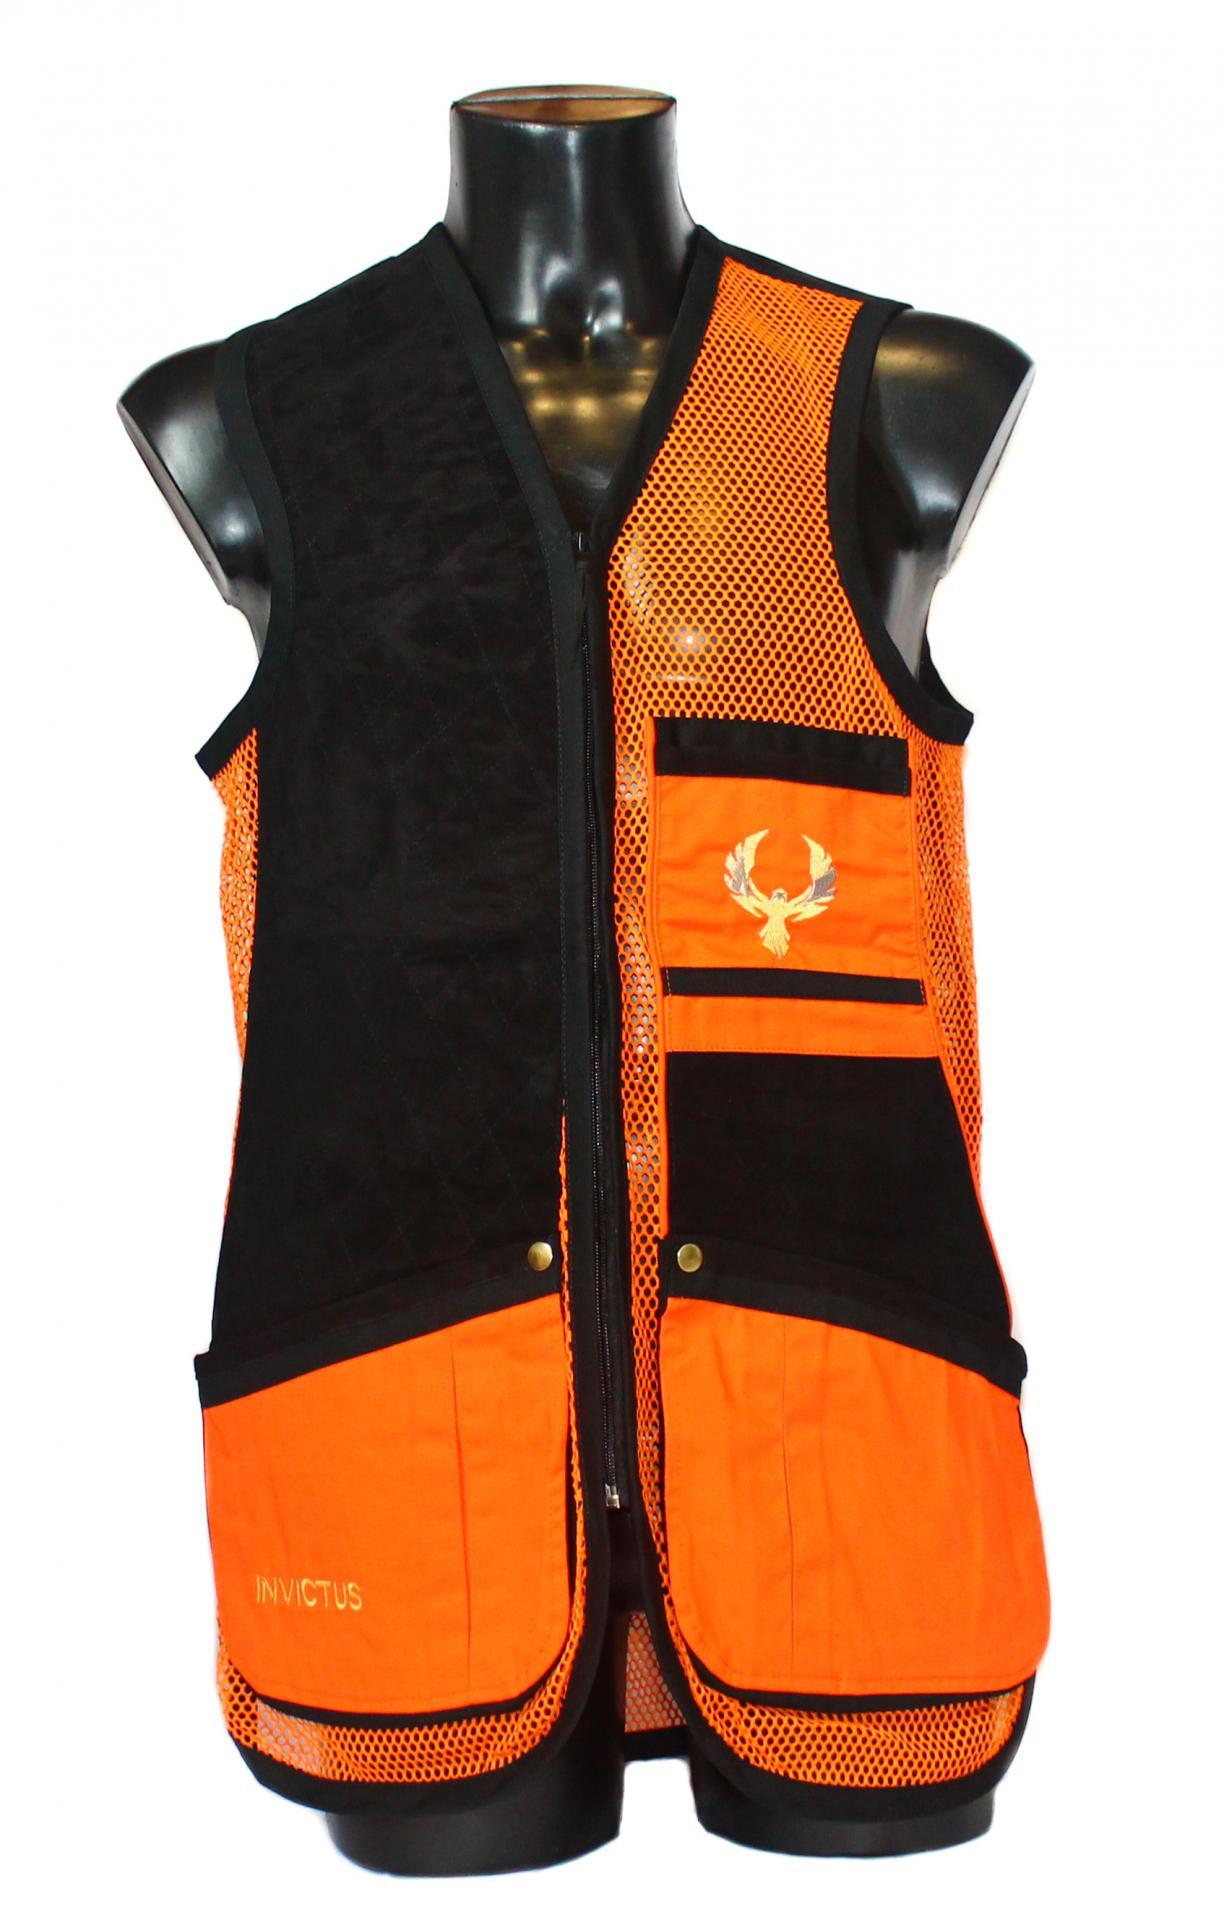 Chaleco GSS INVICTUS (Naranja y Negro)